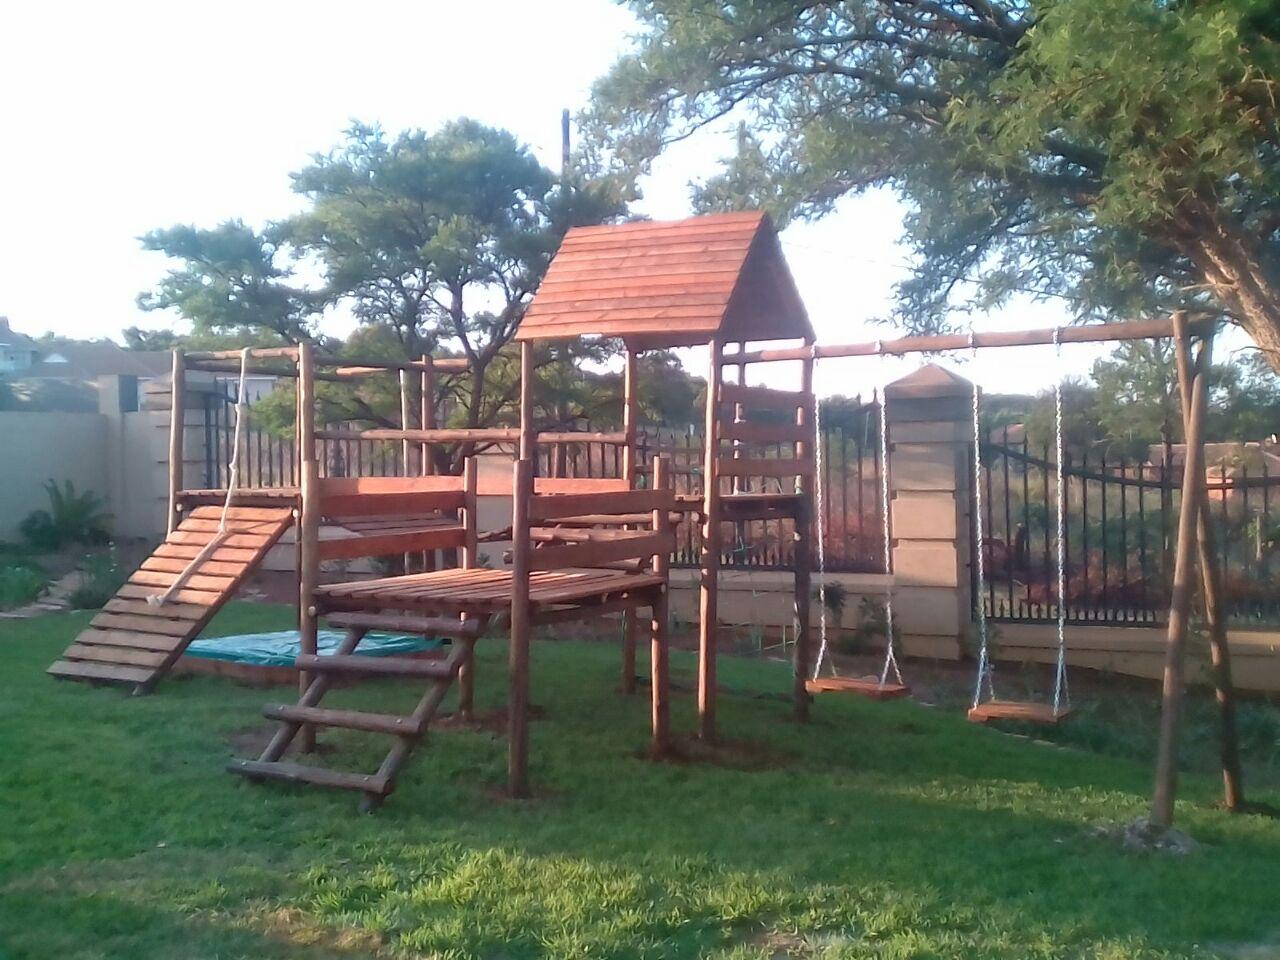 Jungle Gym For Sale >> Joy Trampolines Trampolines Playground Equipment Jungle